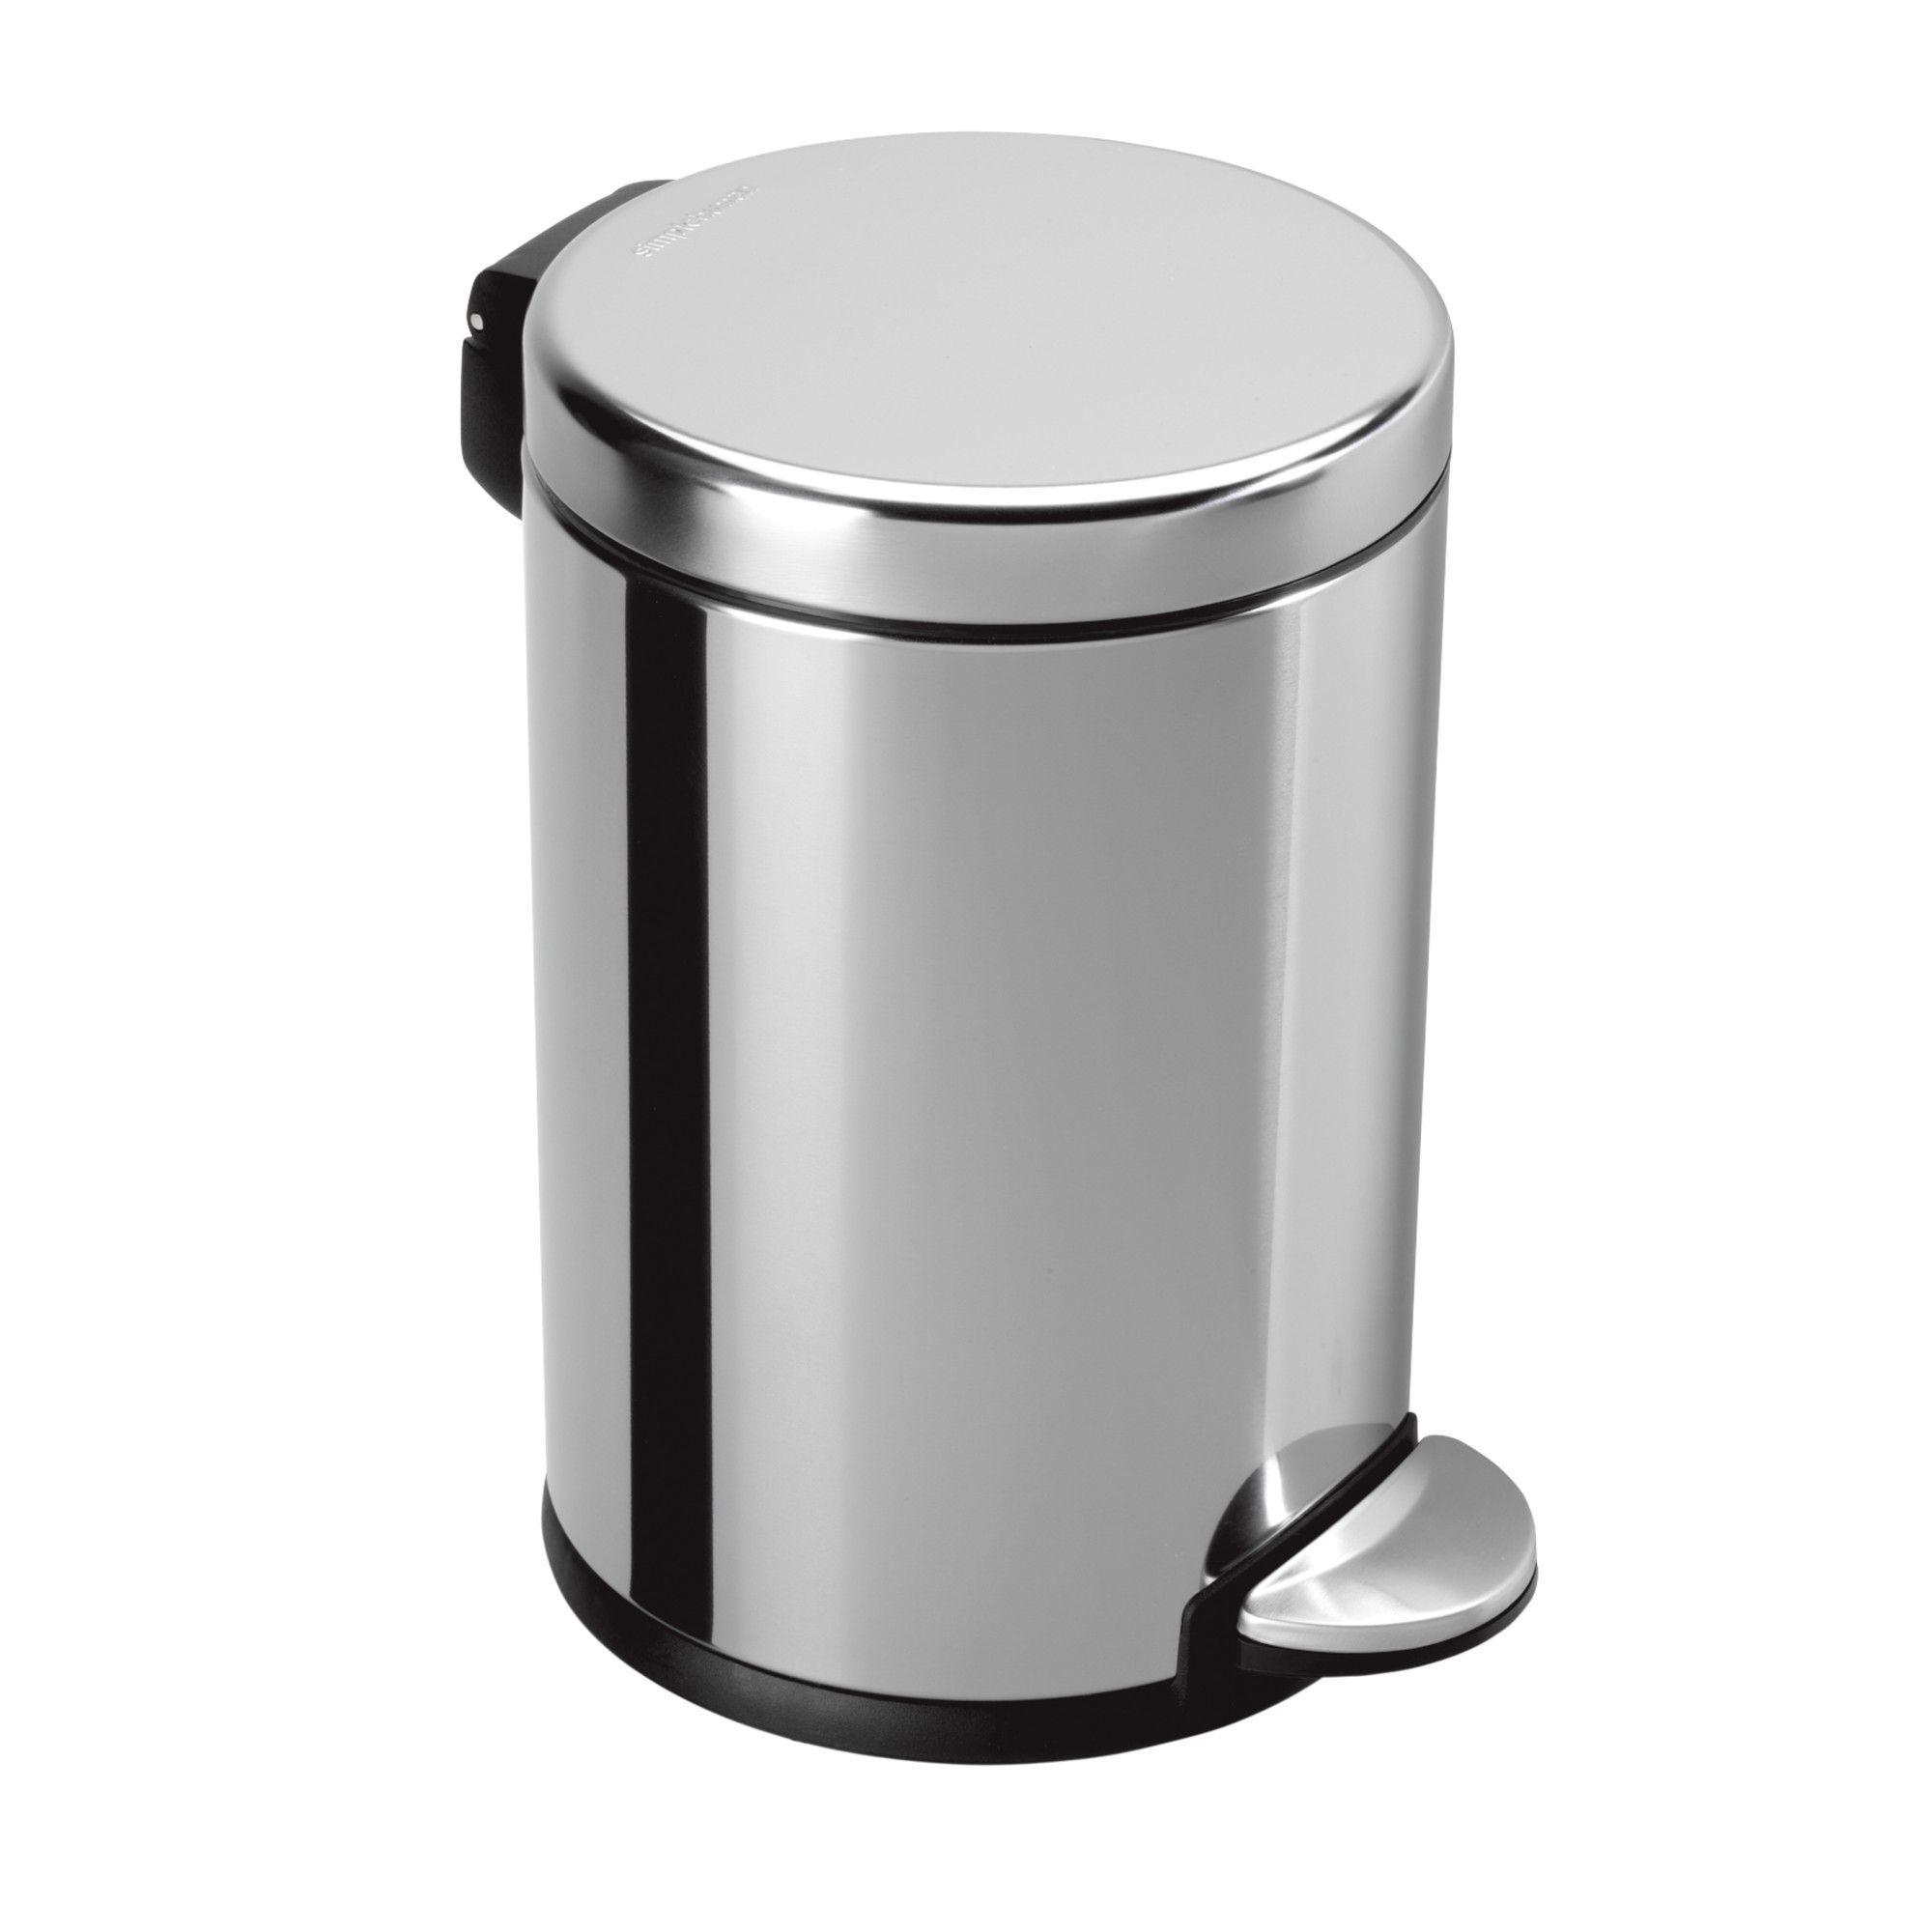 Mini Round Step Trash Can